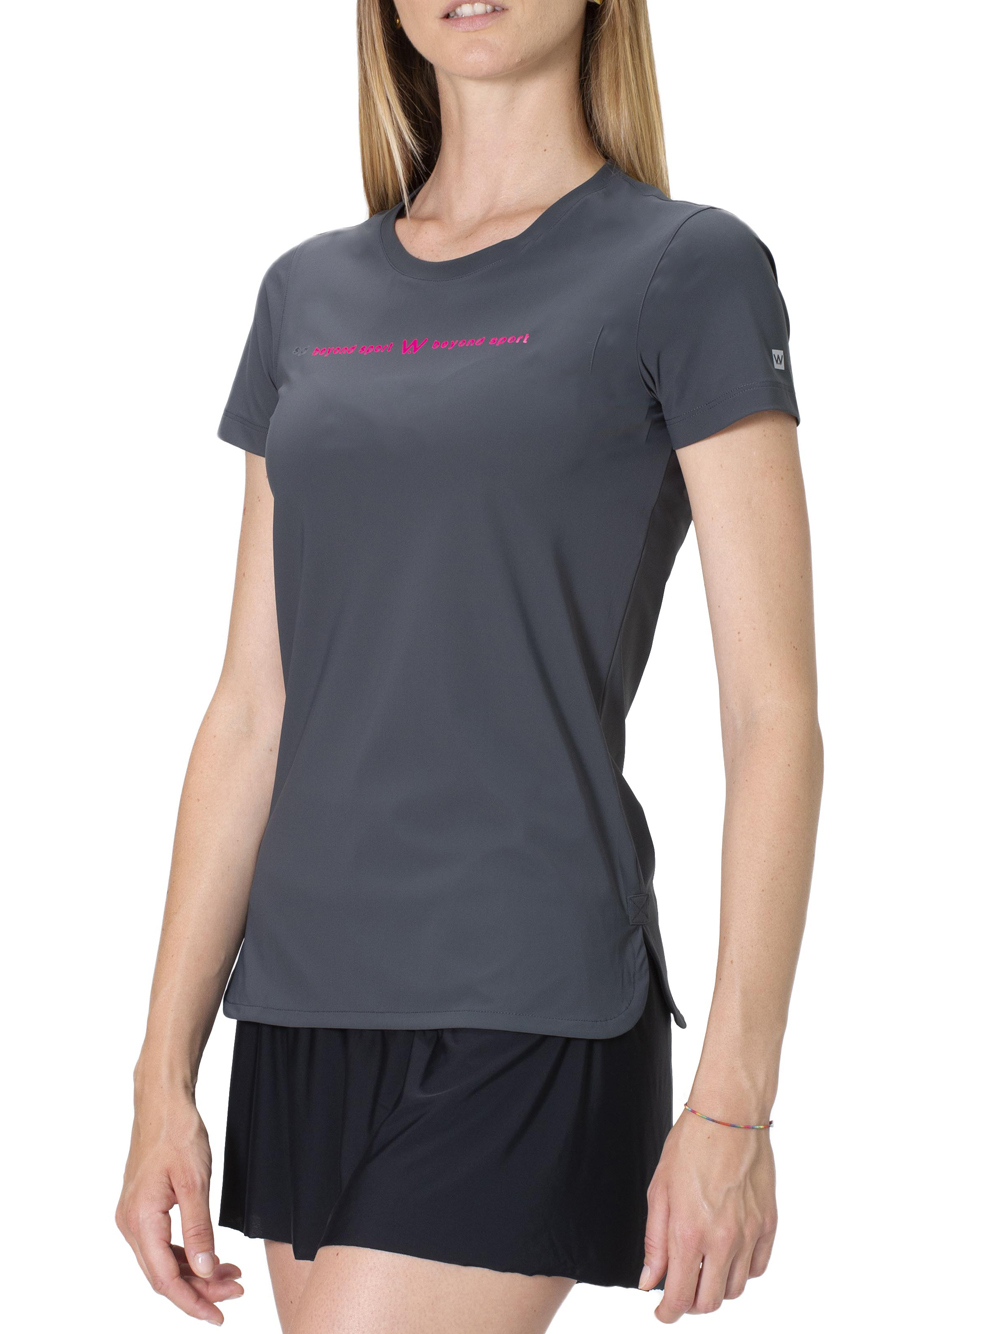 Immagine t-shirt donna sport pietrasanta